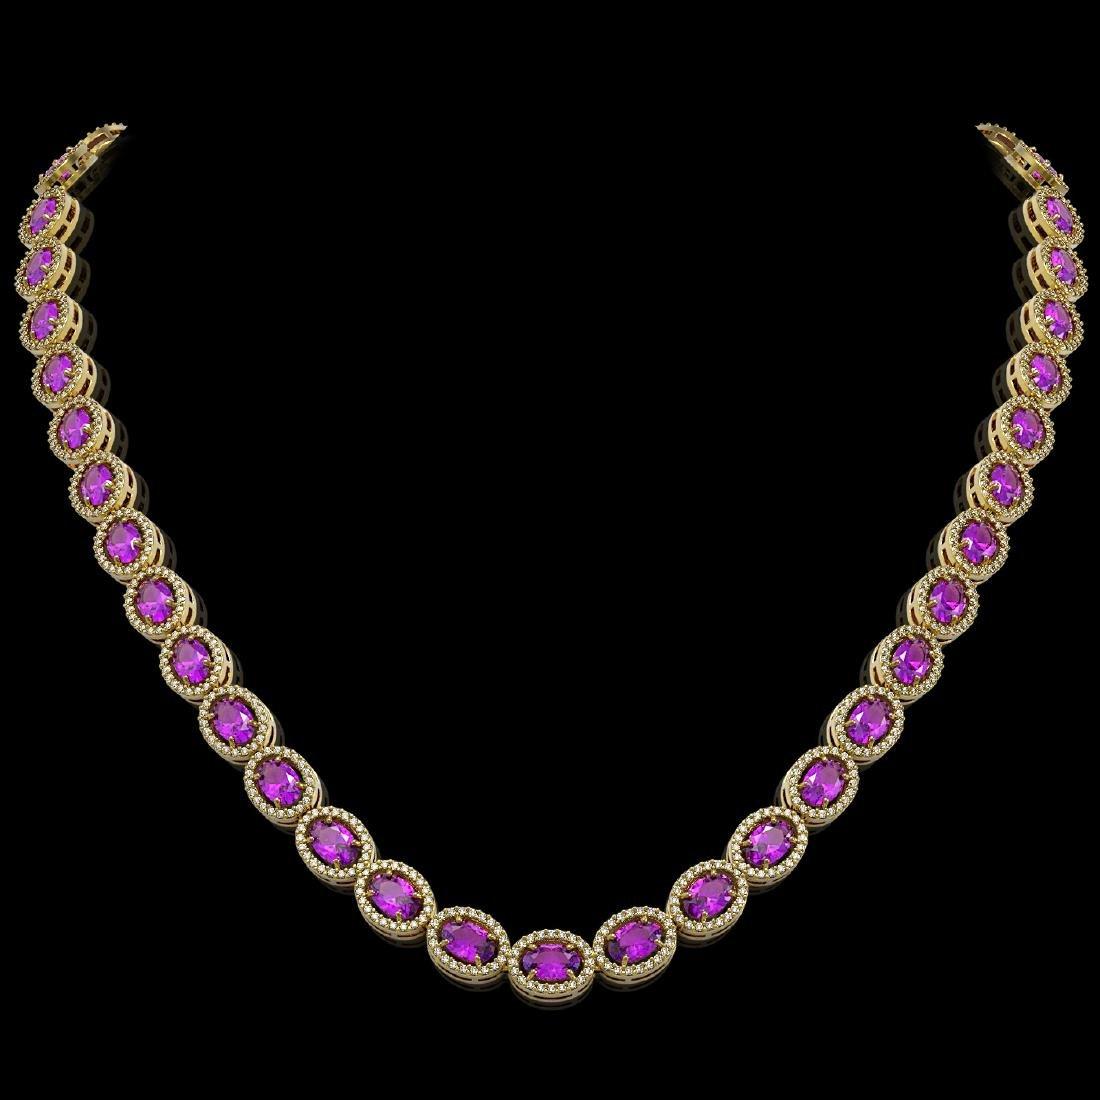 29.38 CTW Amethyst & Diamond Halo Necklace 10K Yellow